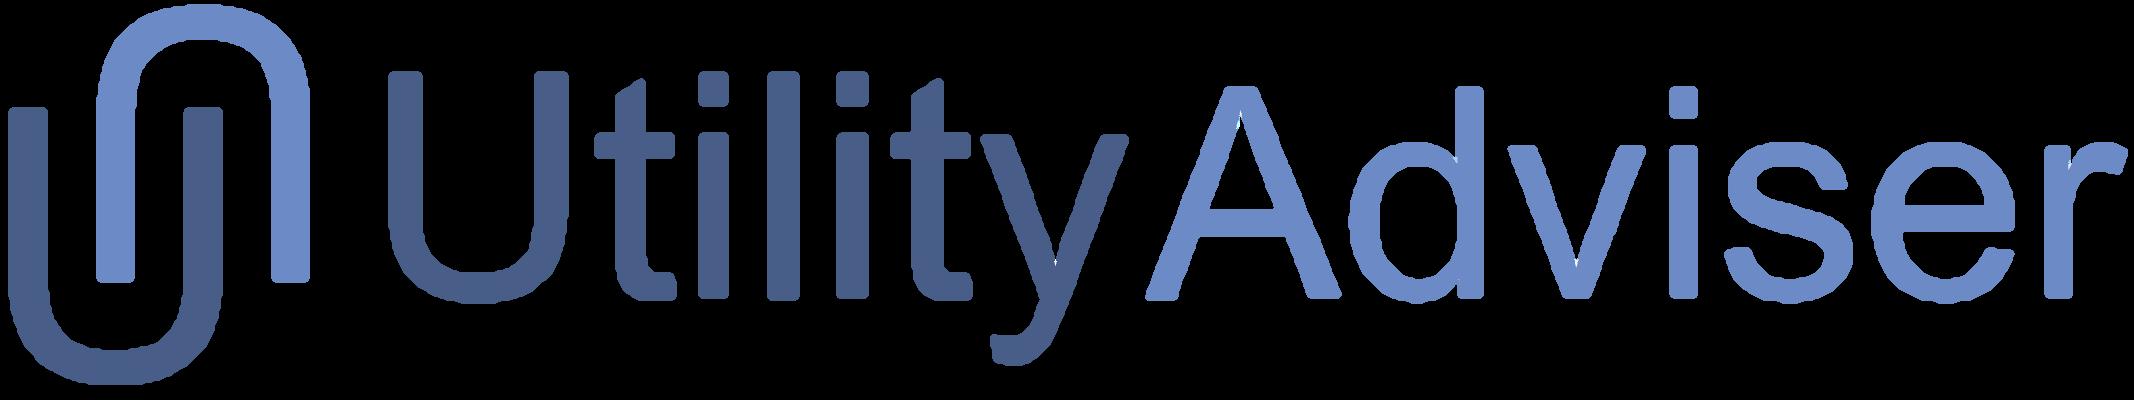 utility adviser logo